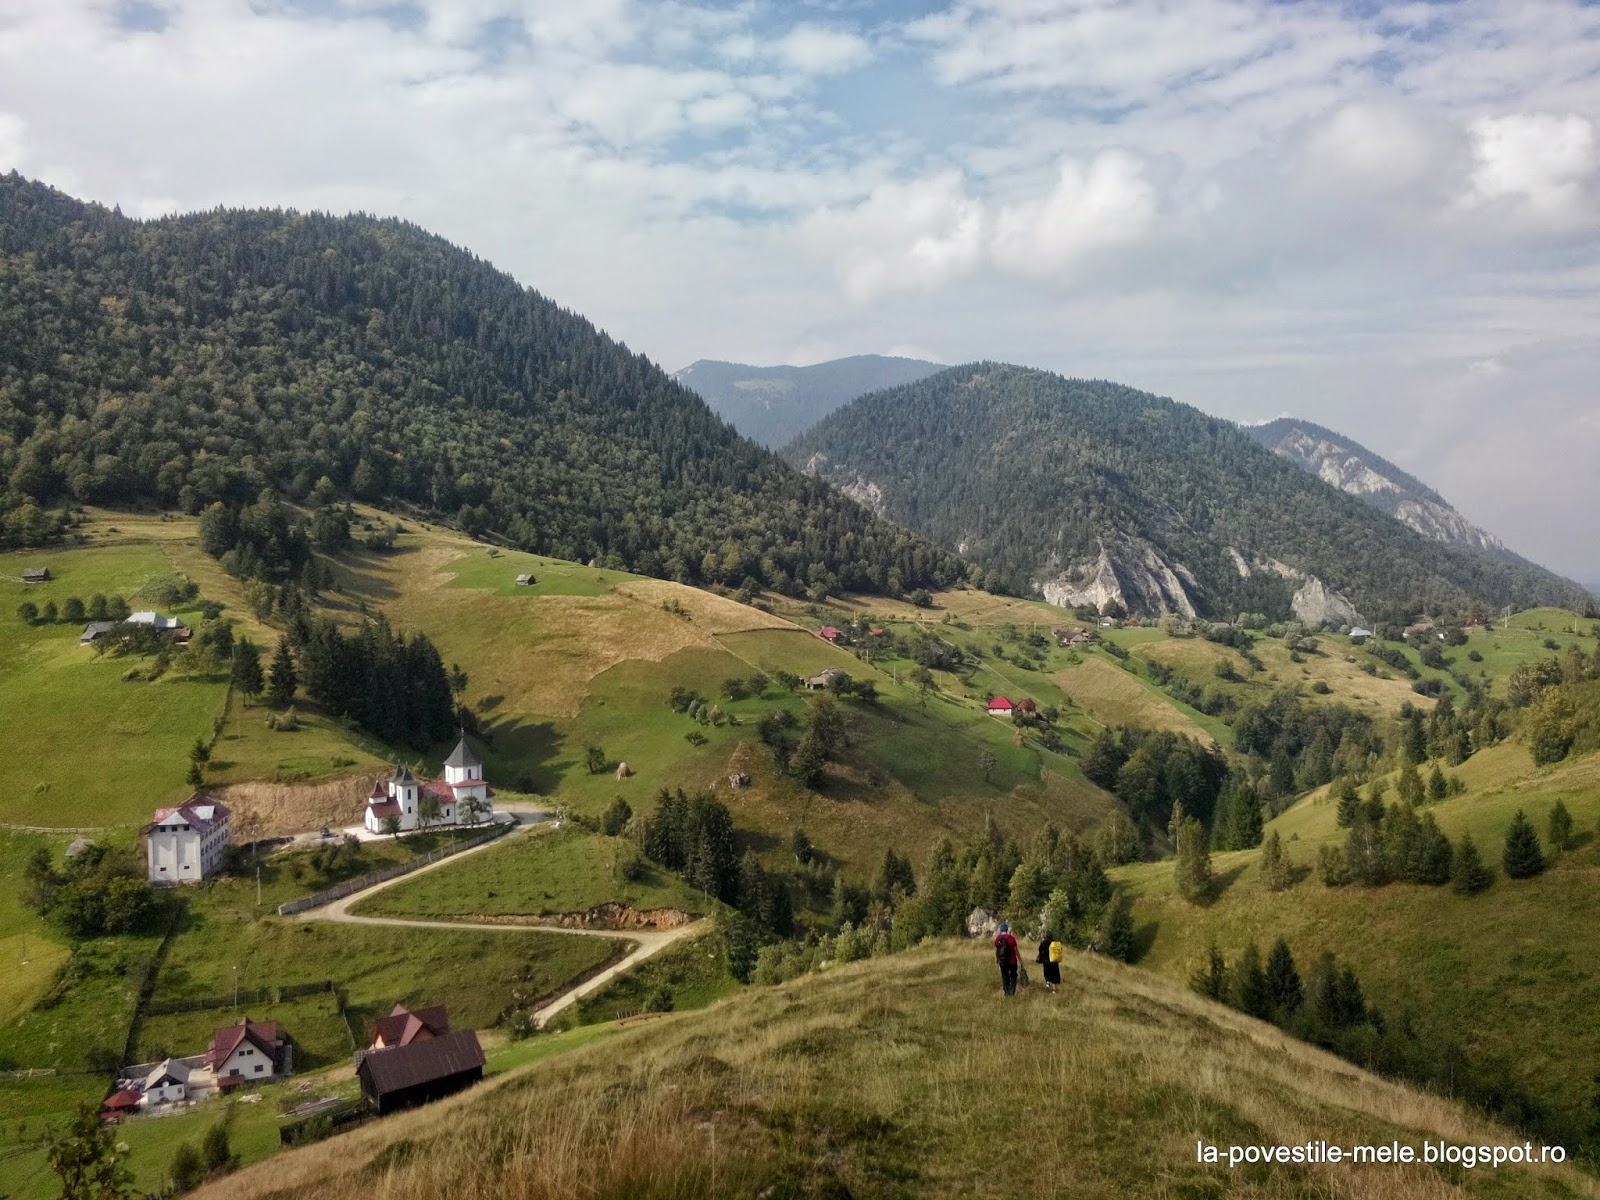 http://la-povestile-mele.blogspot.ro/2014/12/piatra-craiului-satele-magura-si.html